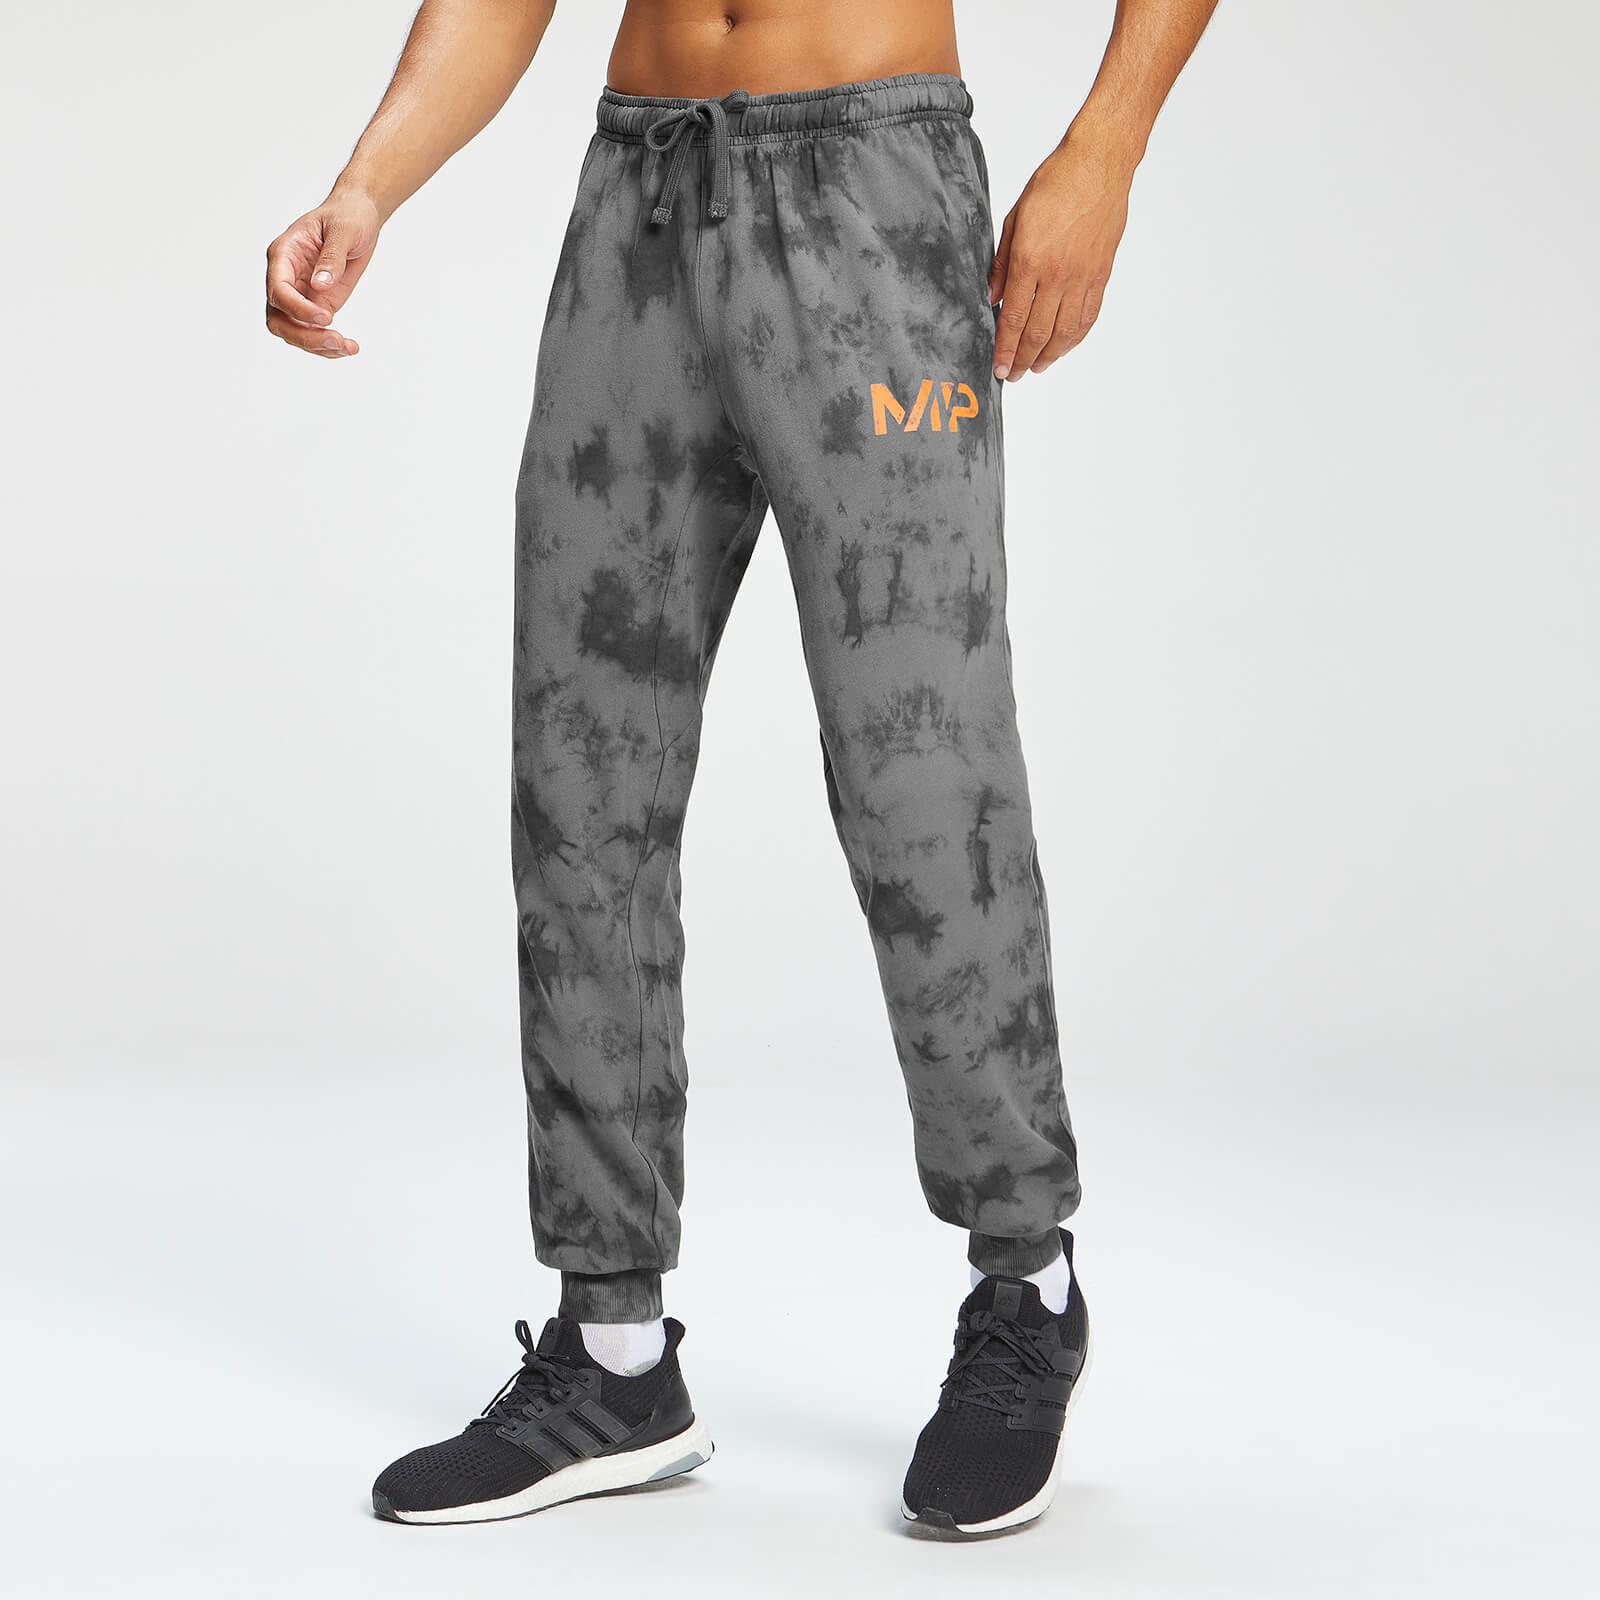 Купить MP Men's Adapt Tie Dye Joggers - Carbon/Storm - XXS, Myprotein International